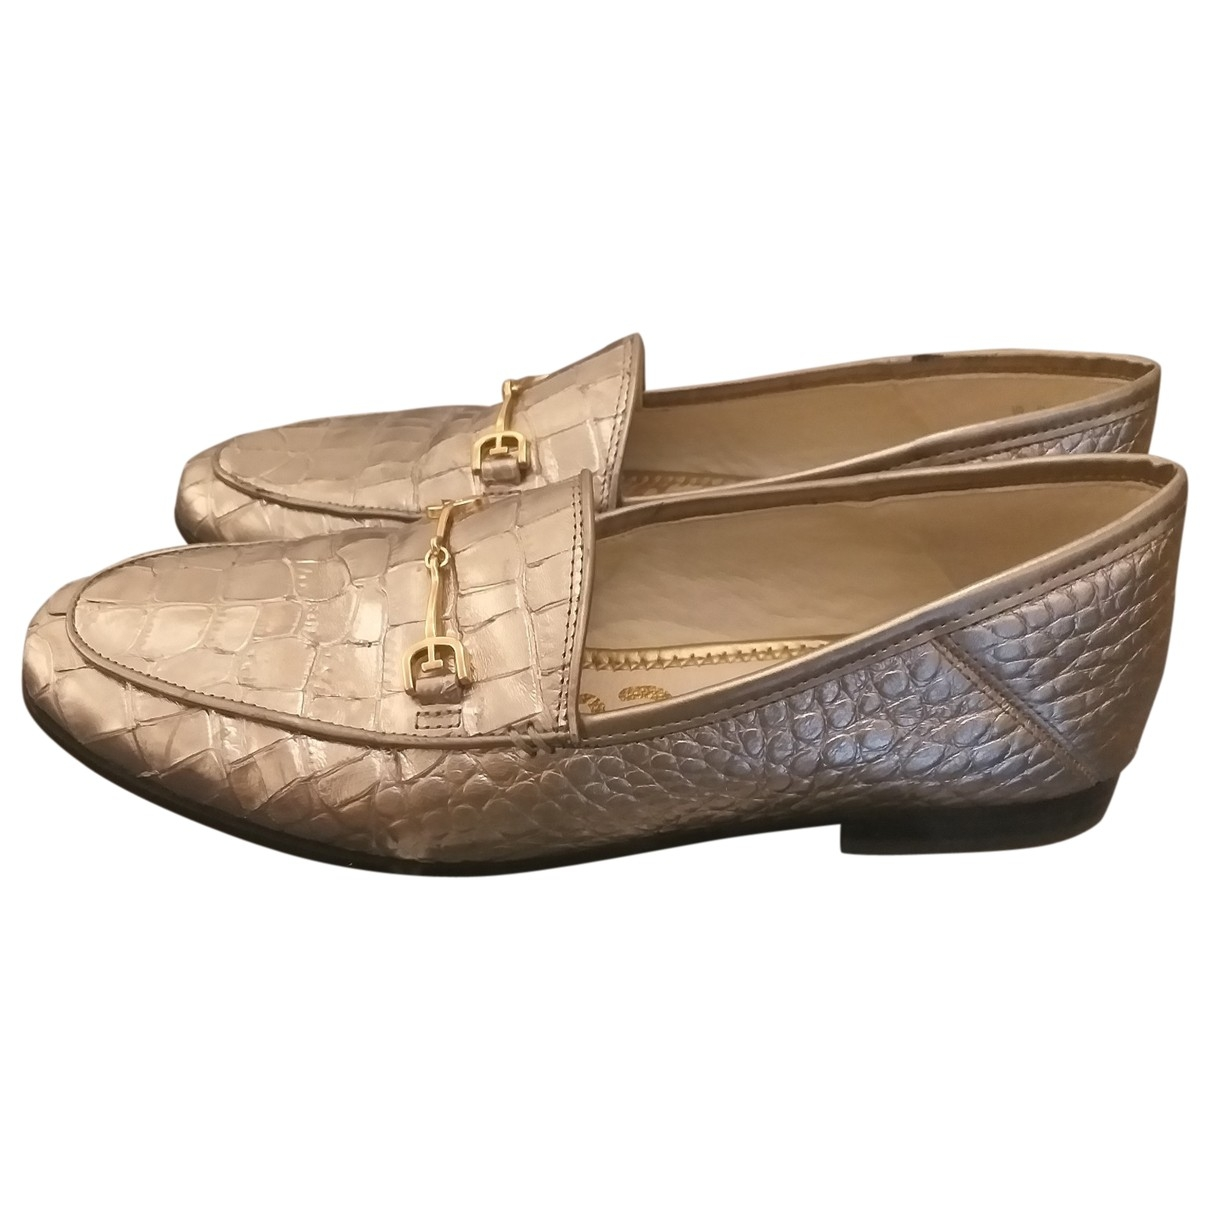 Sam Edelman \N Silver Leather Flats for Women 38 EU